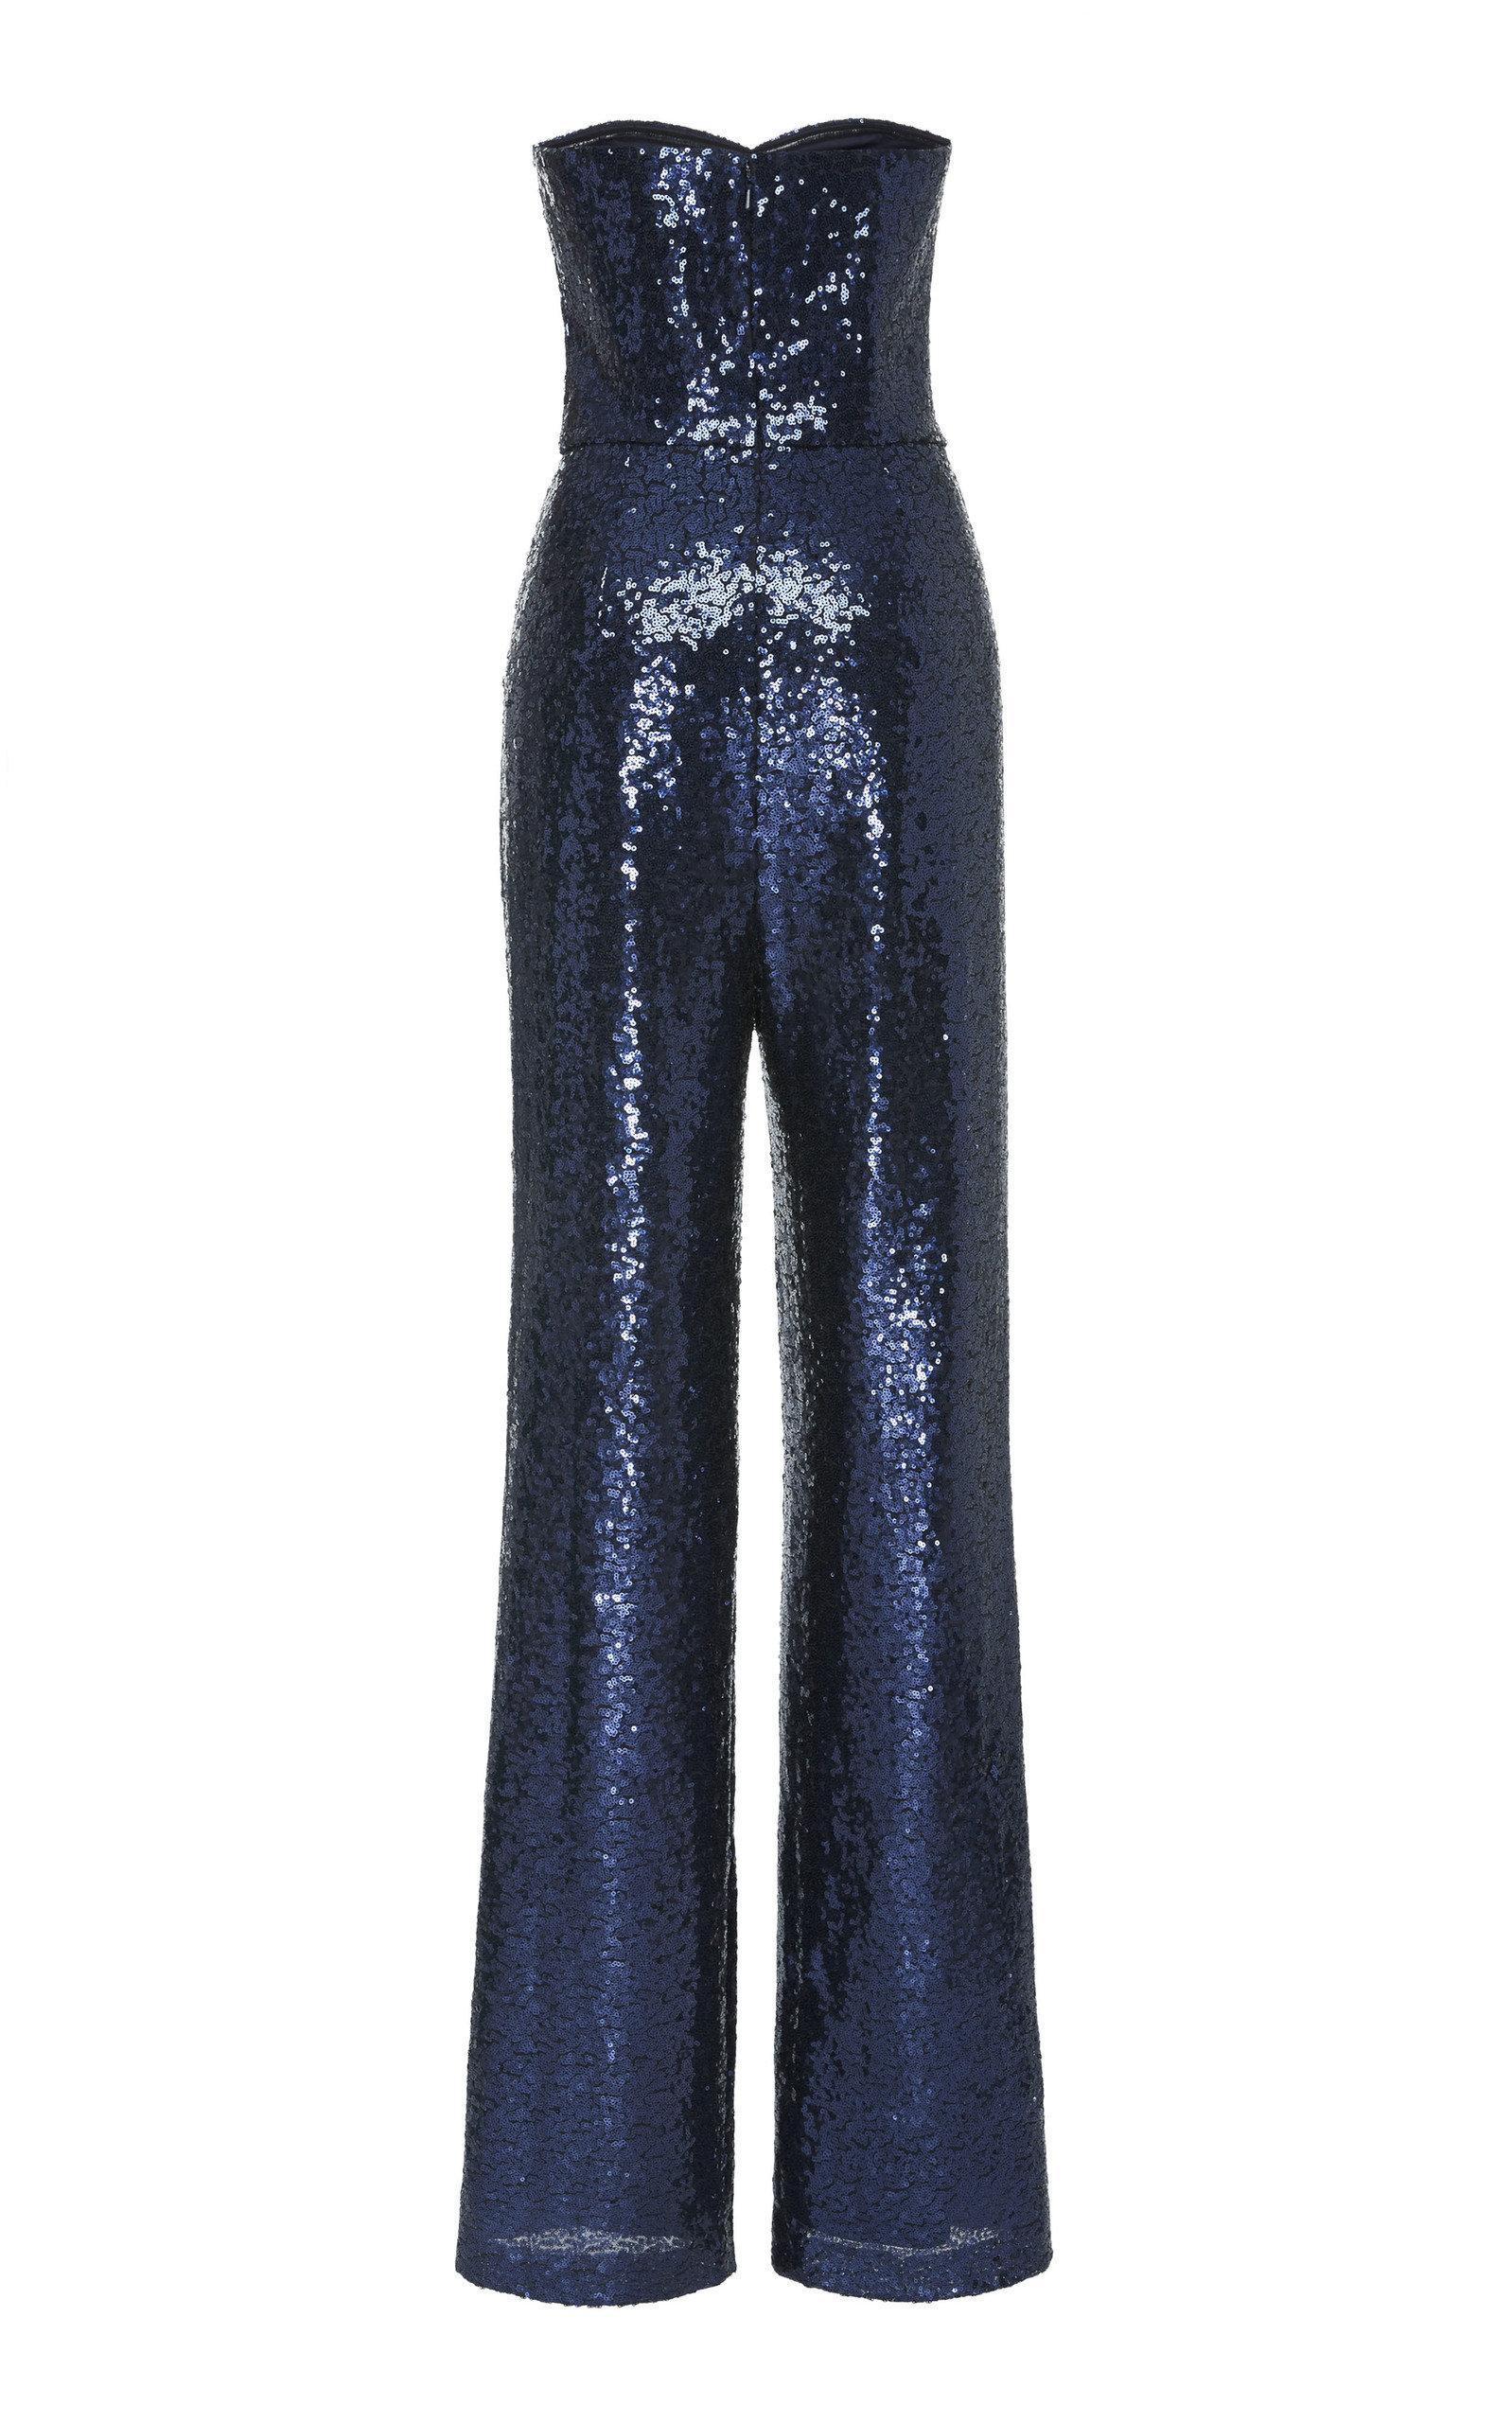 bbef9dbb23 Saloni - Blue Aurelie Strapless Sequin Jumpsuit - Lyst. View fullscreen